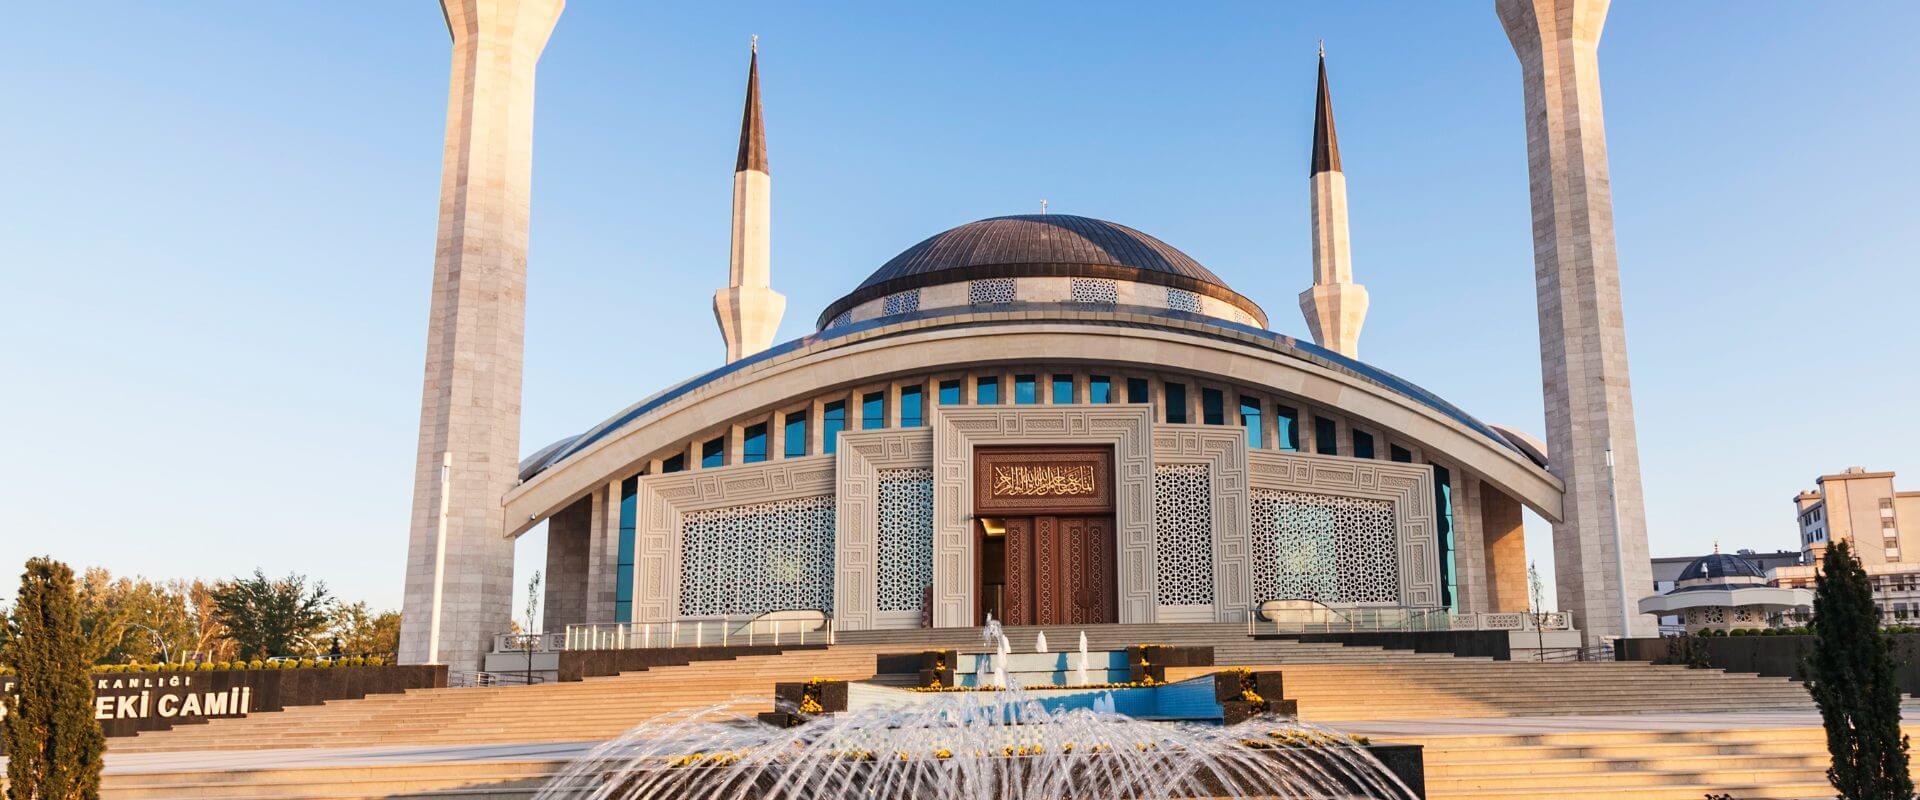 Bild Ankara